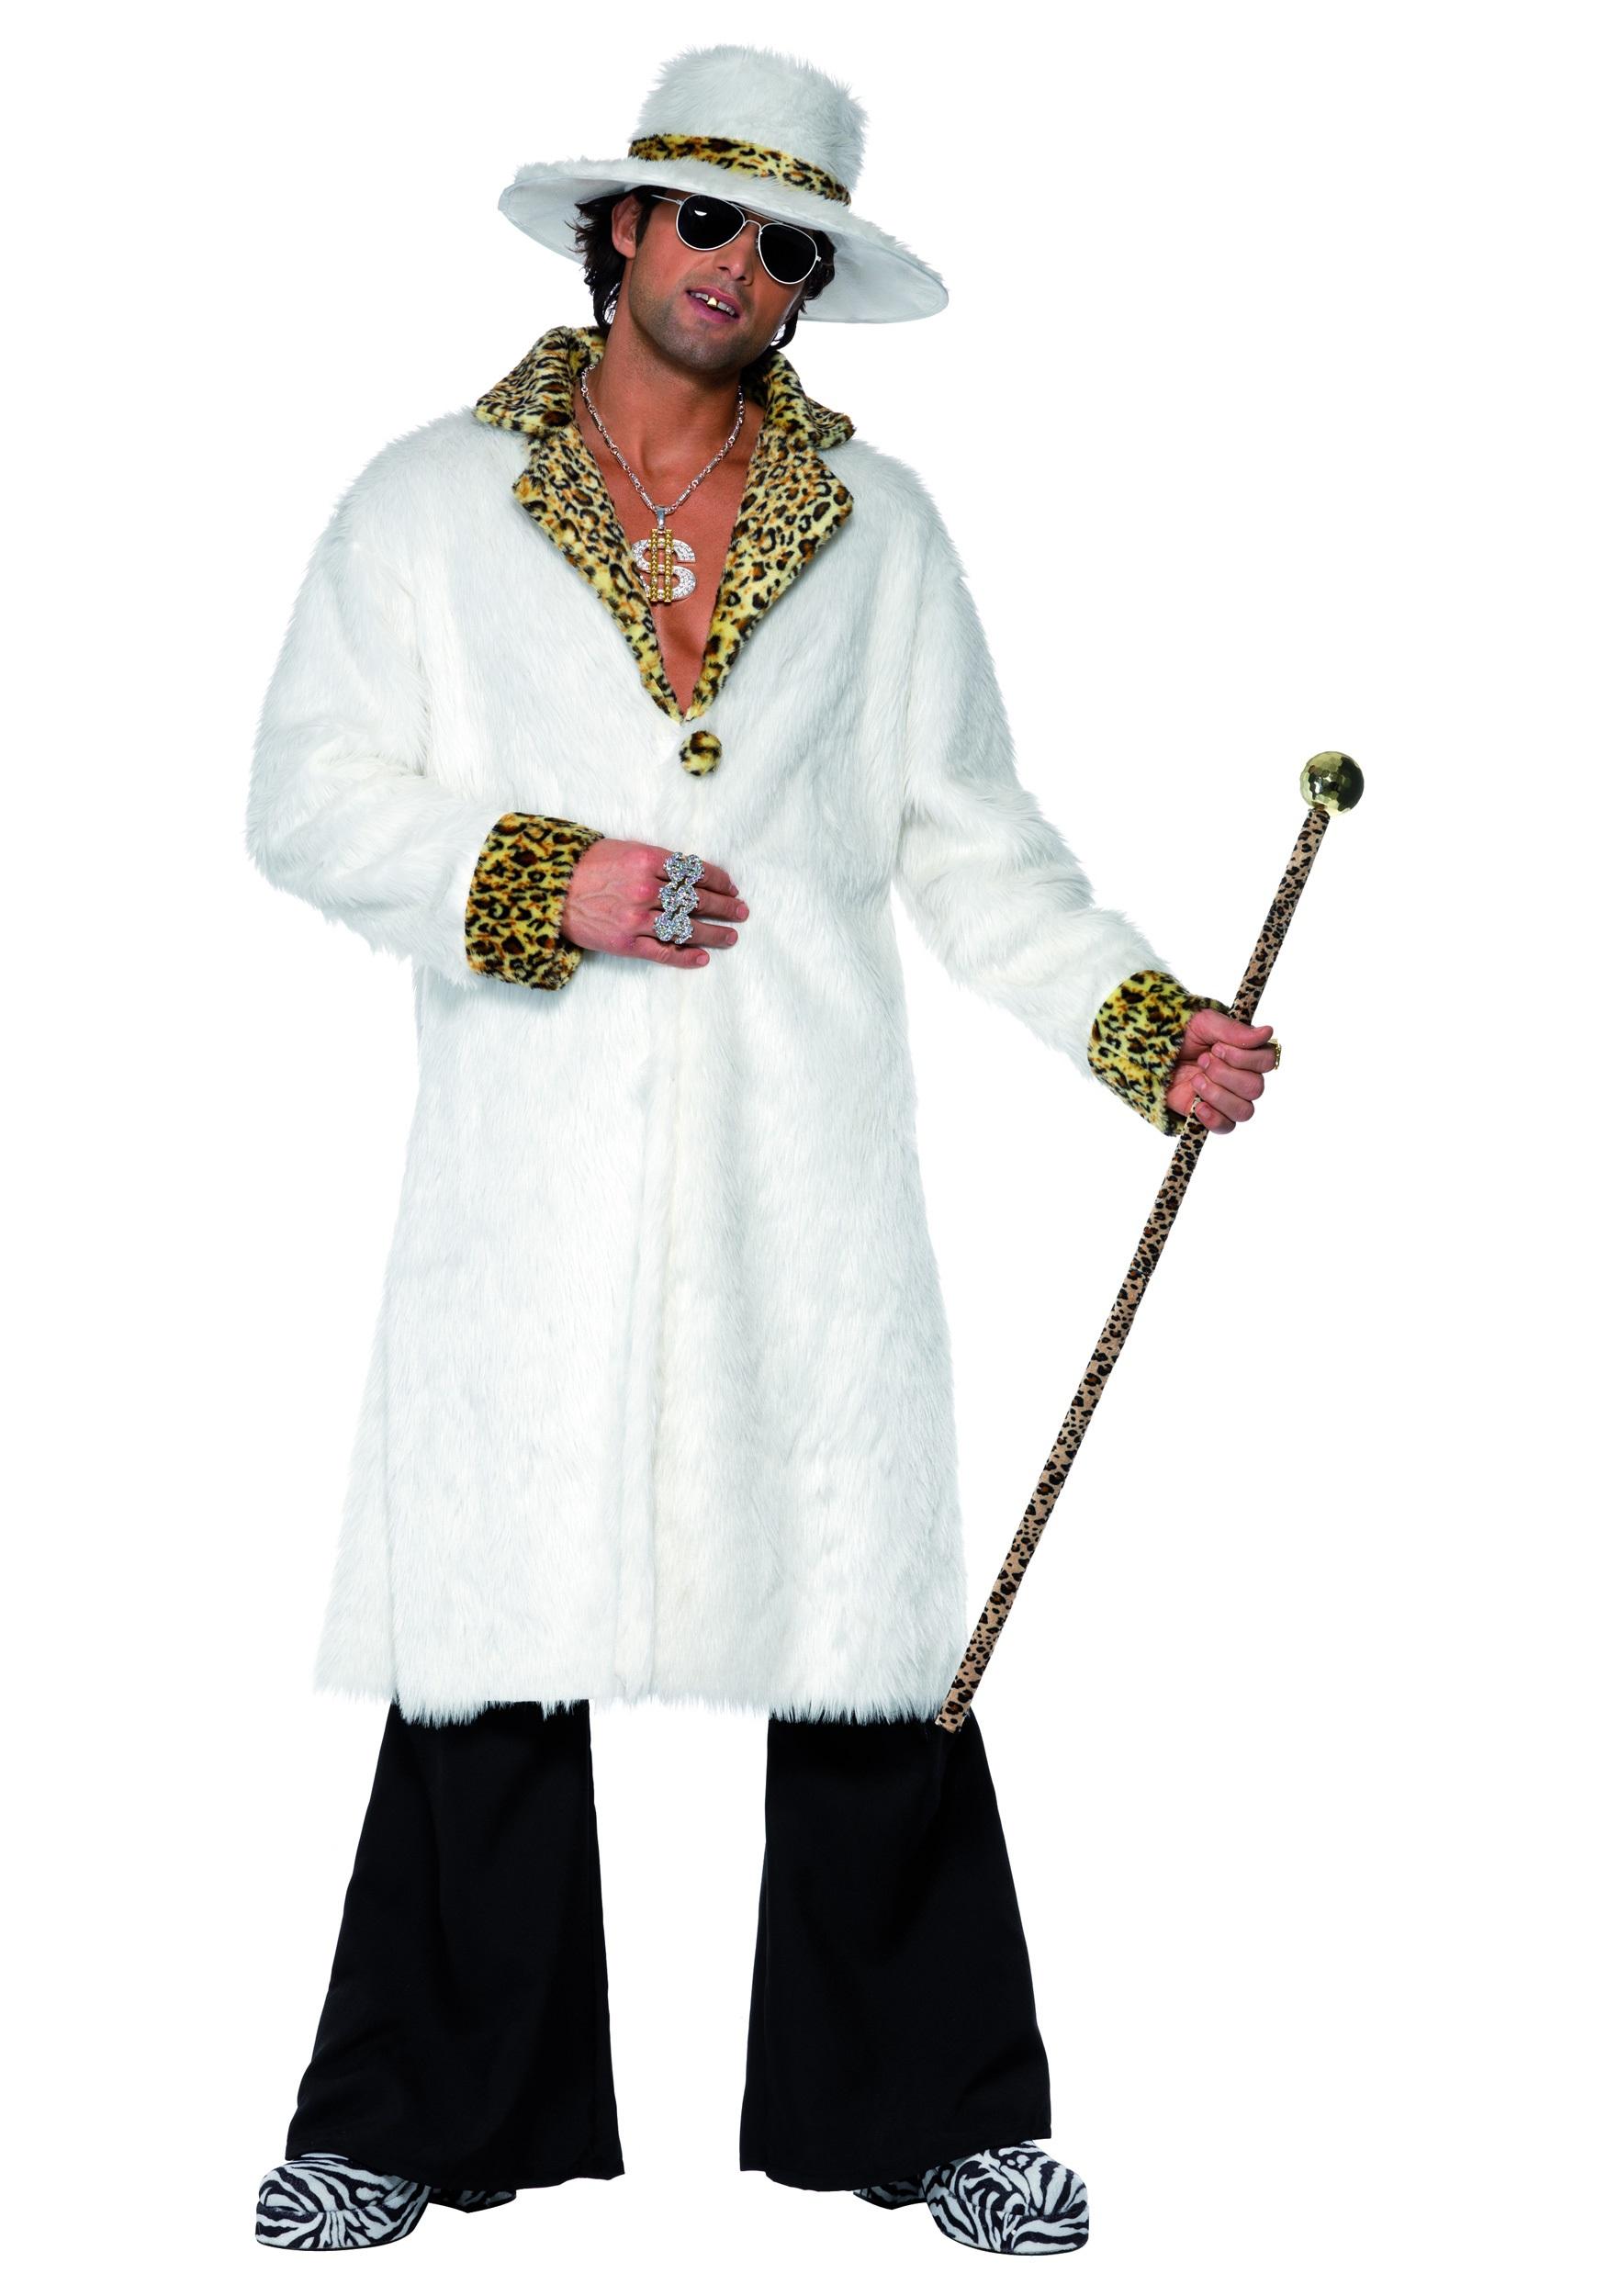 Hustla Pimp Costume - It Halloween Costume